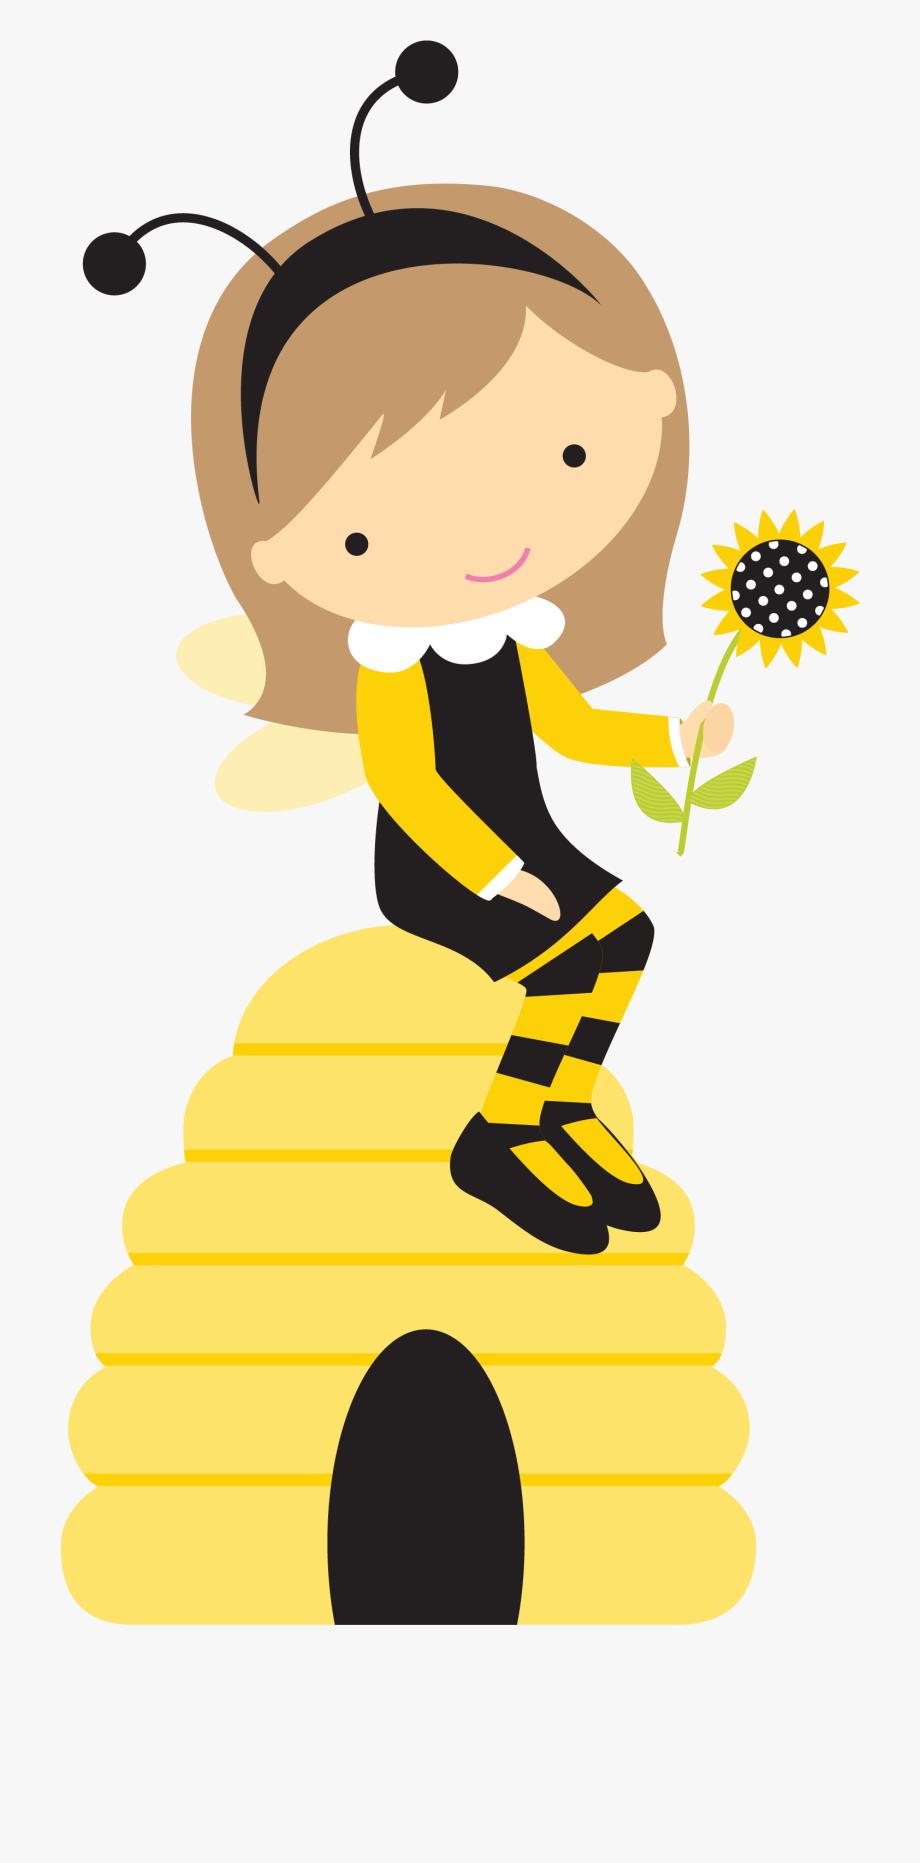 Baby queen bee clipart clipart free download Imagens Da Abelhinha Pinterest Bees Clip Art - Lady Bumble Bee ... clipart free download